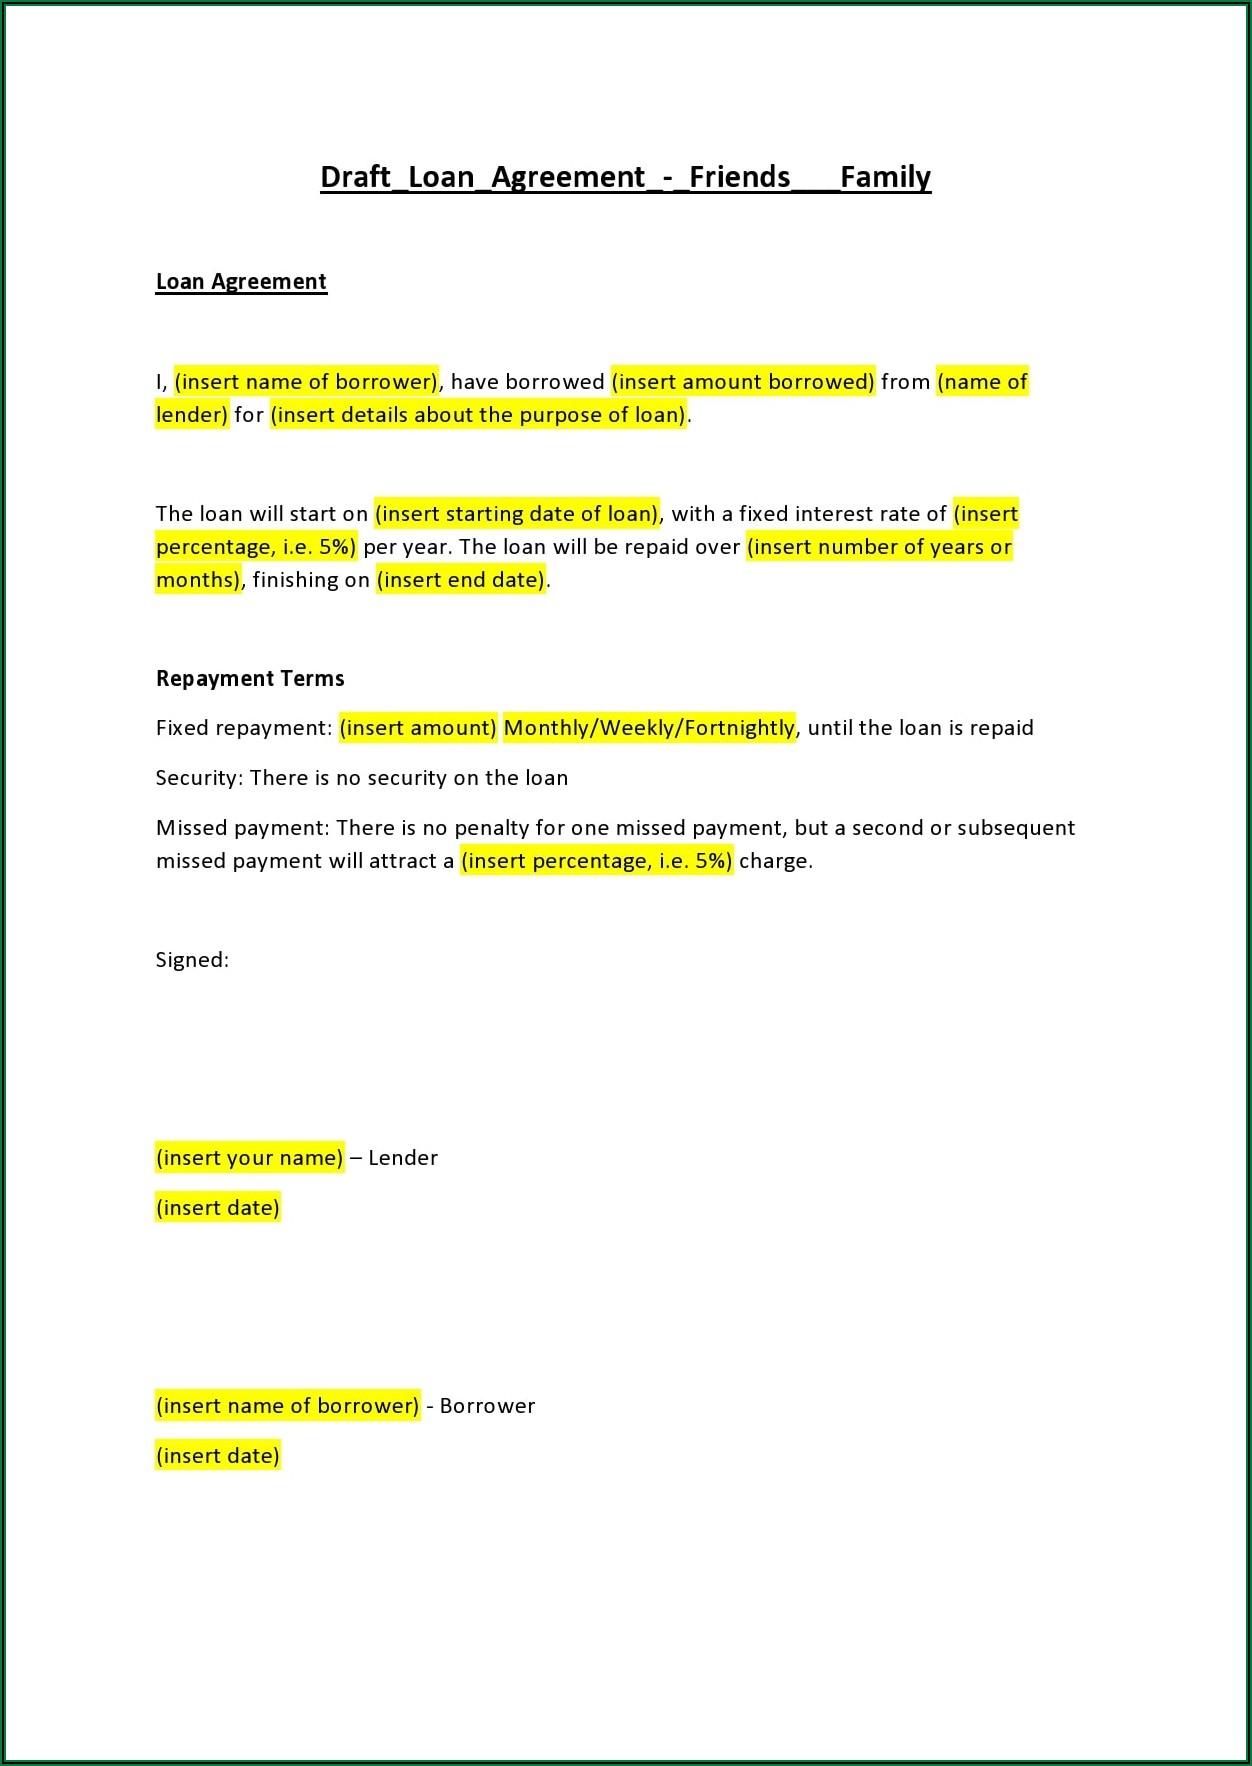 Sample Loan Agreement Form Between Friends